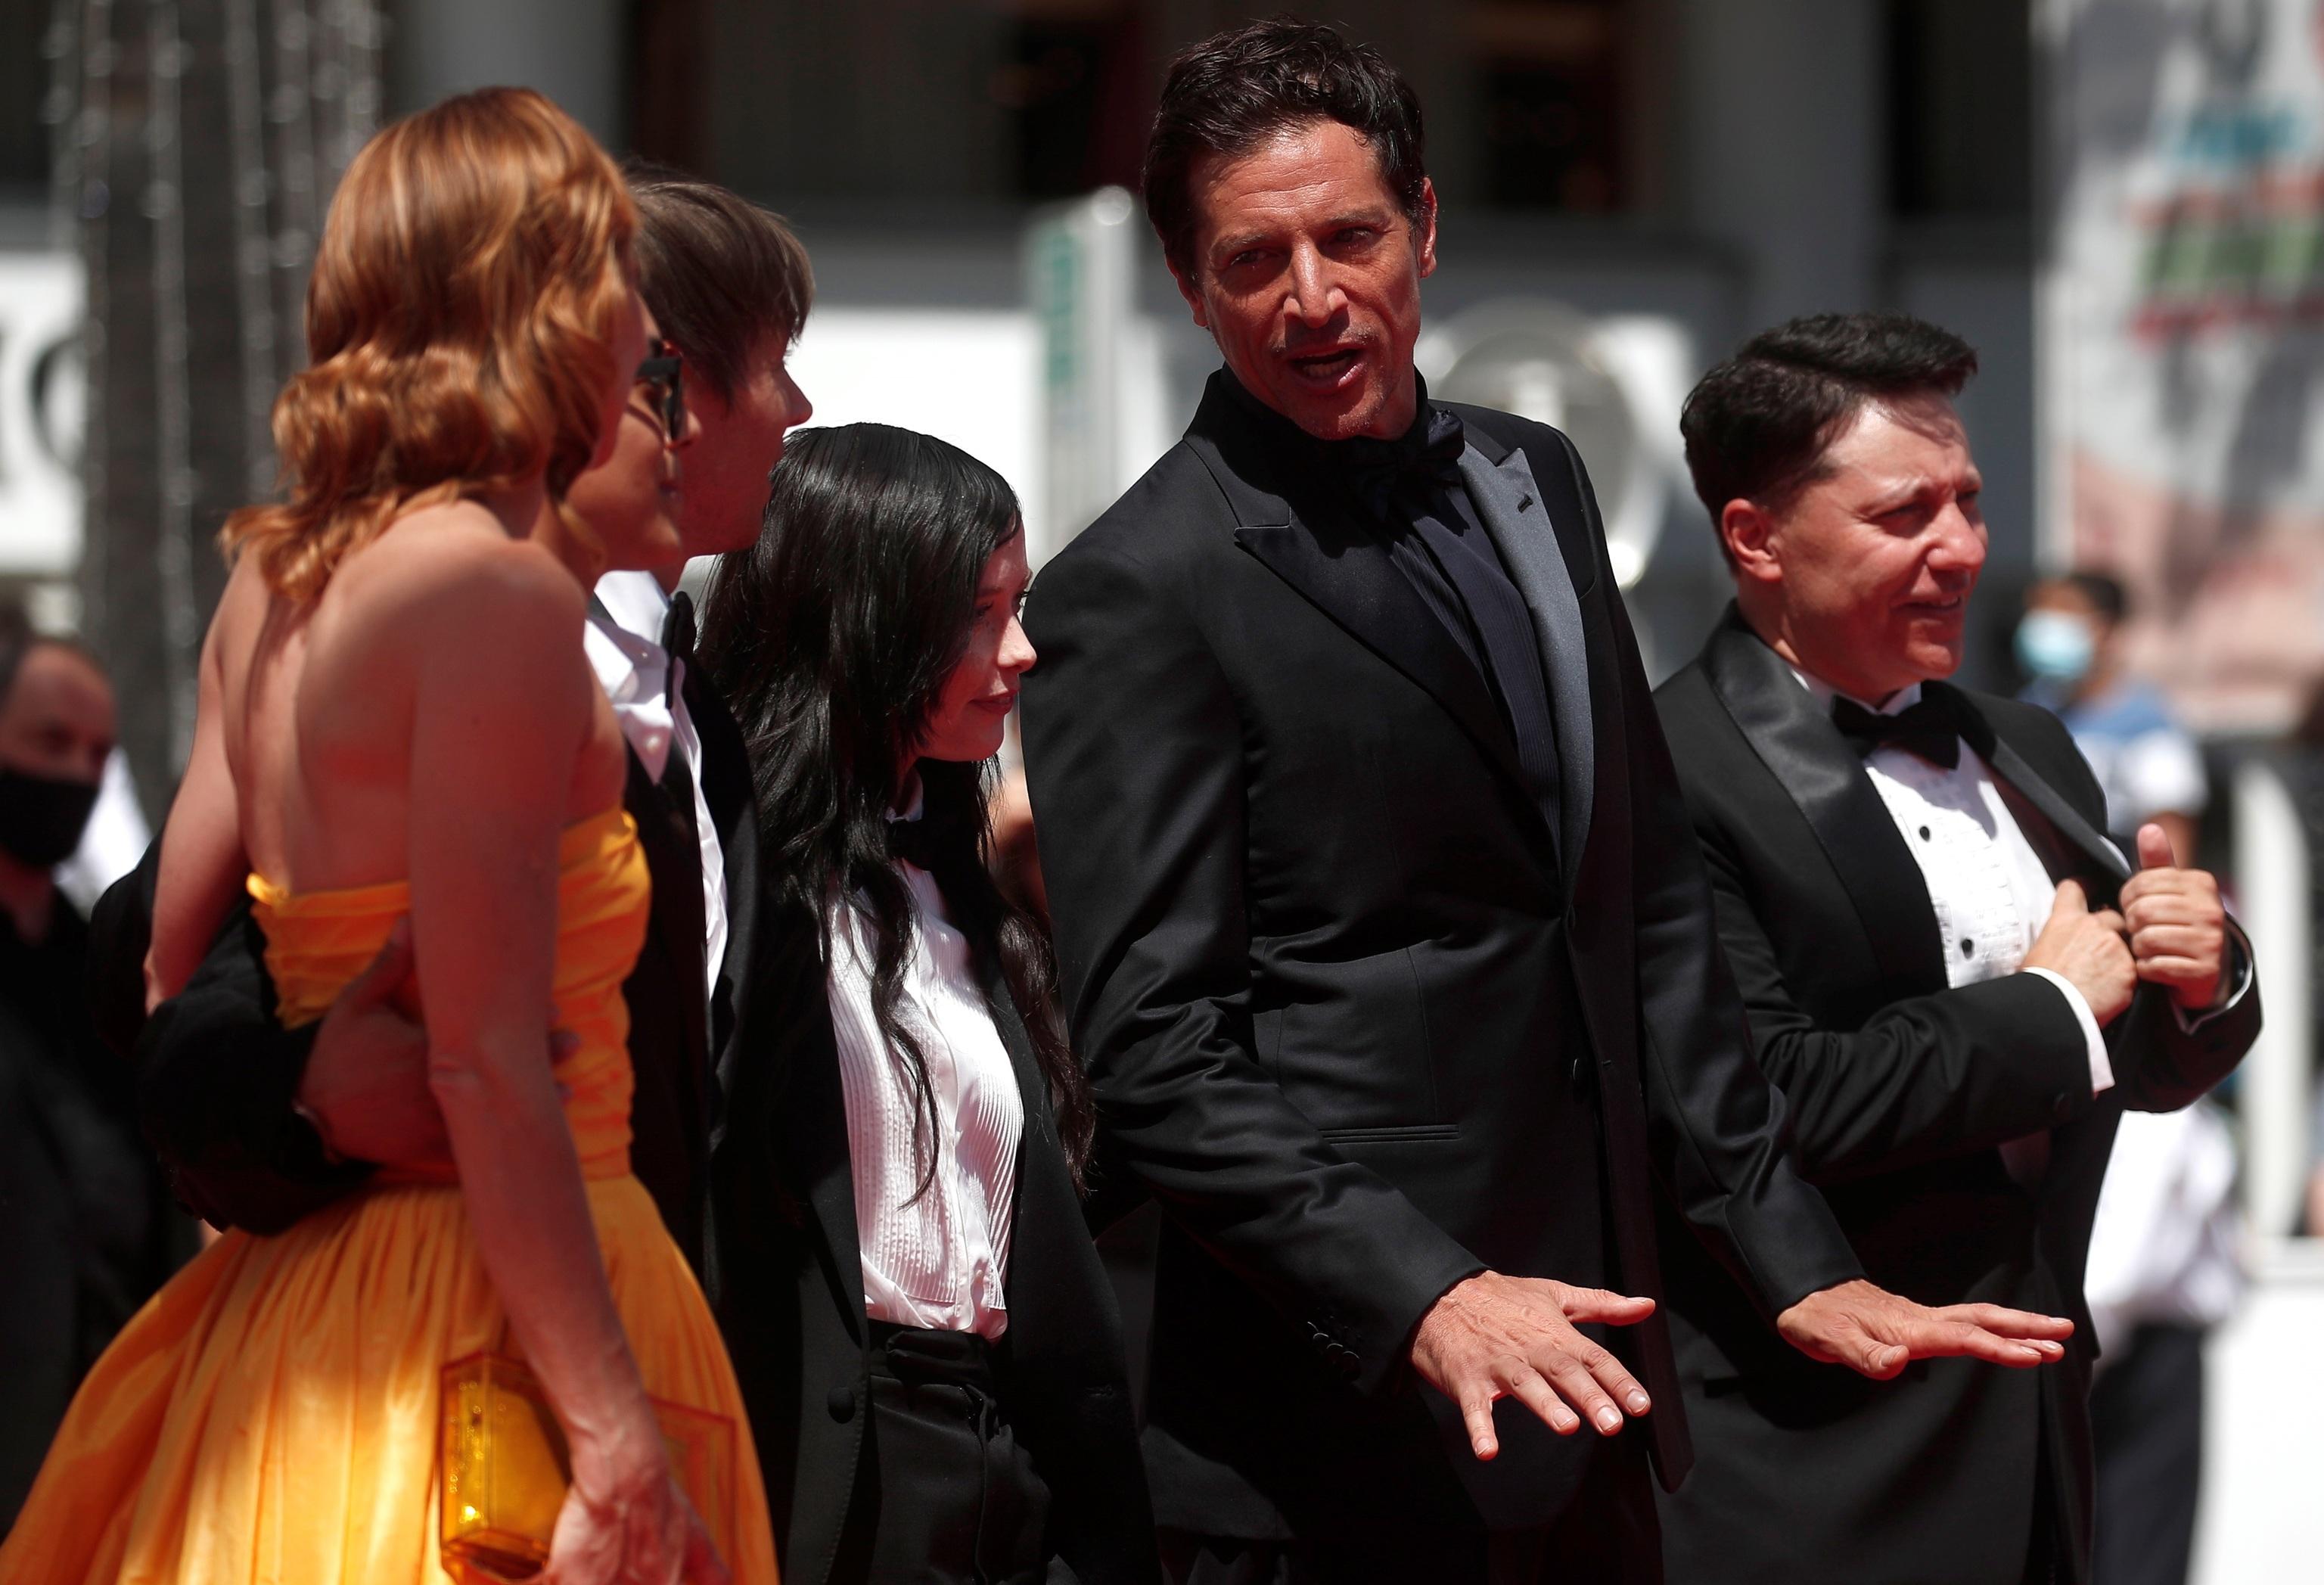 Bree Elrod, Brittney Rodriguez, Sean Baker,;, Suzanna Son, Simon Rex y Chris Bergoch presentan 'Red Rocket'.HIT gt;Cannes lt;/HIT gt;, France, 14 July 2021. The festival runs from 06 to 17 July. (Cine, Francia) EFE/EPA/IAN LANGSDON